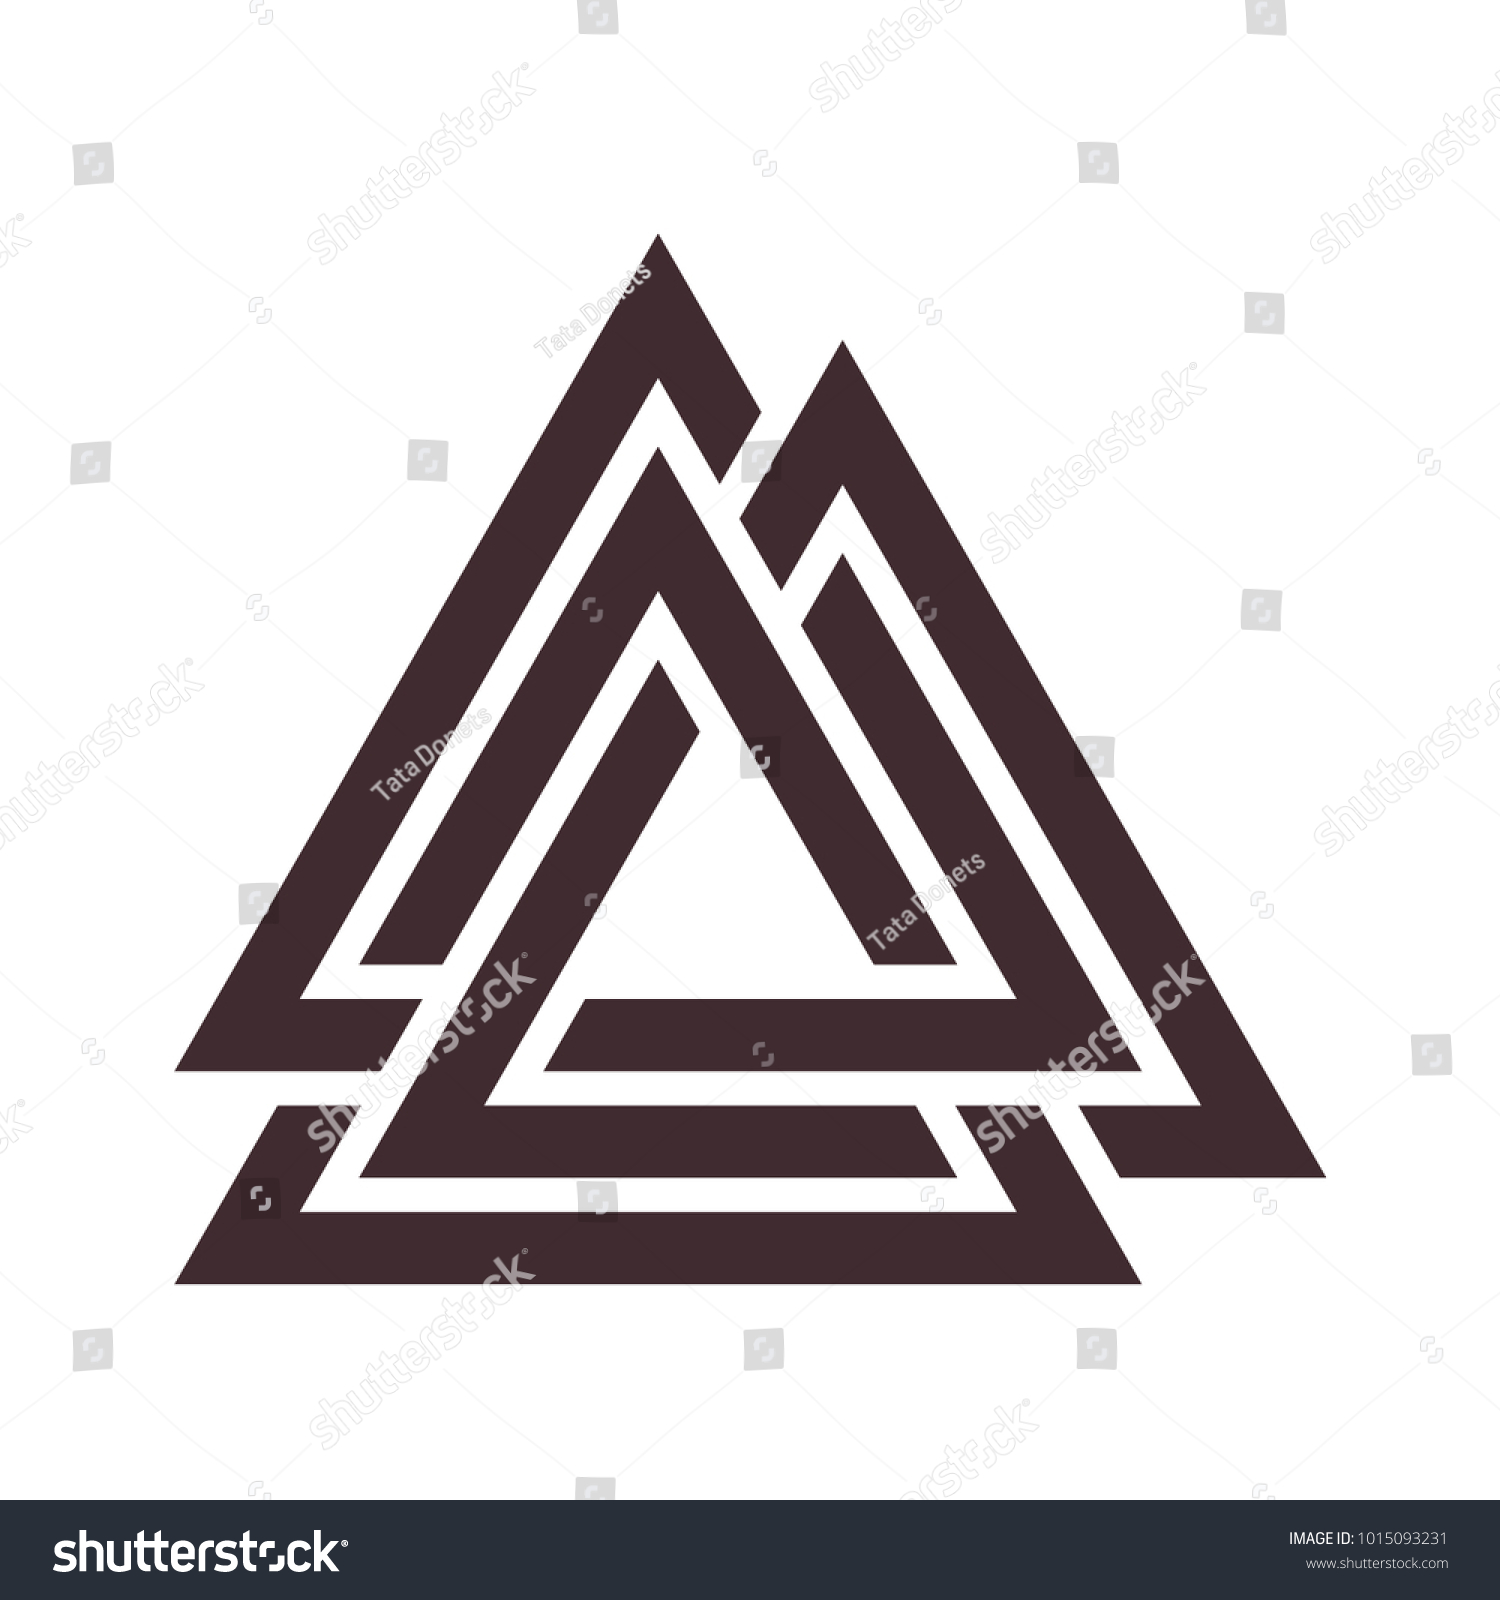 Vector Triangle Illustration Valknut Symbol Germanic Stock Vector